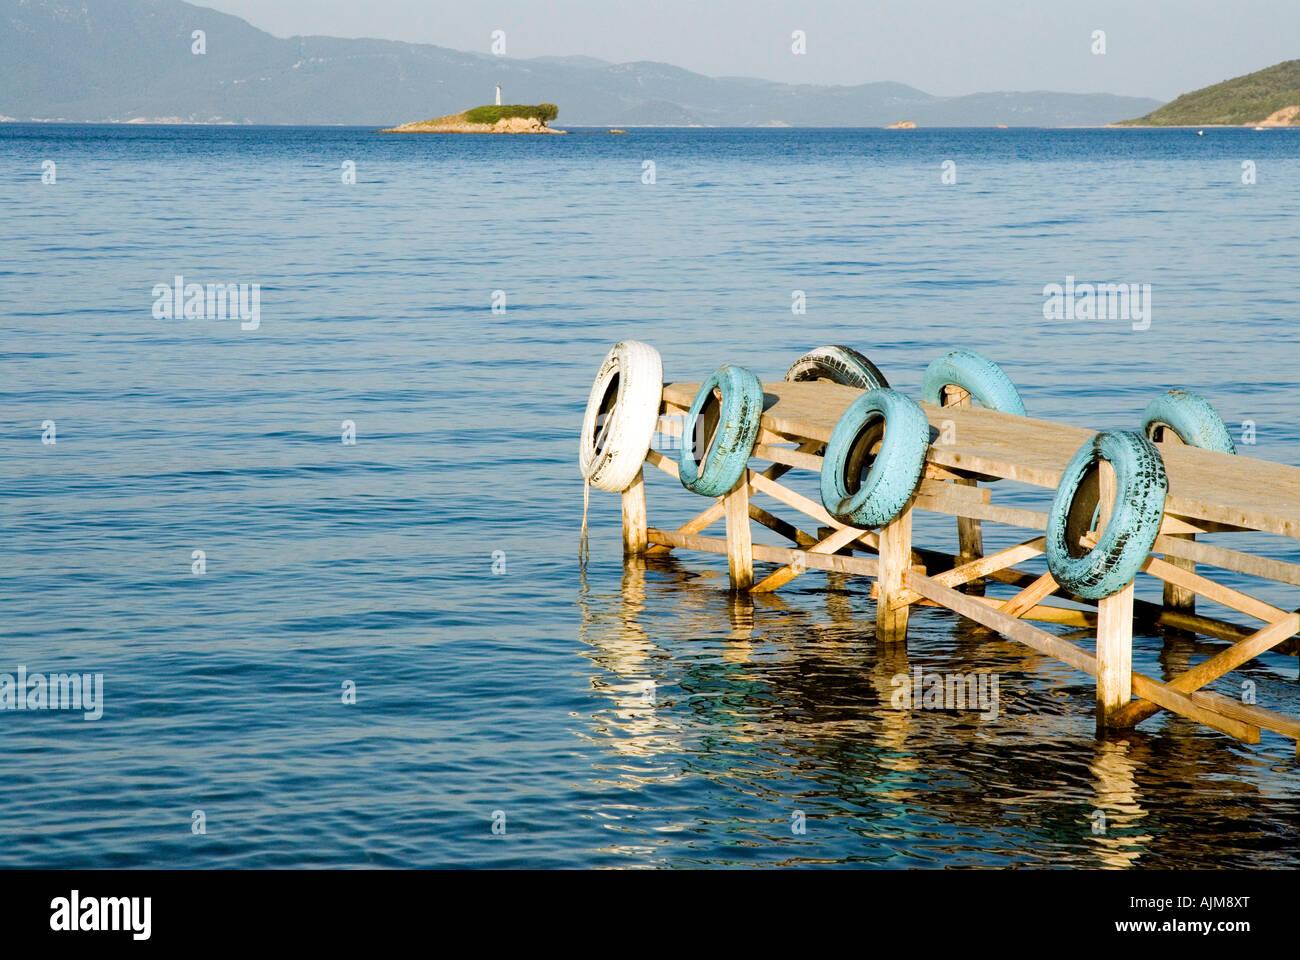 Ferry jetty Tzaneria Nostos beach Kalamaki peninsula Skiathos Island Sporades Aegean Sea Mediterranean Greece - Stock Image